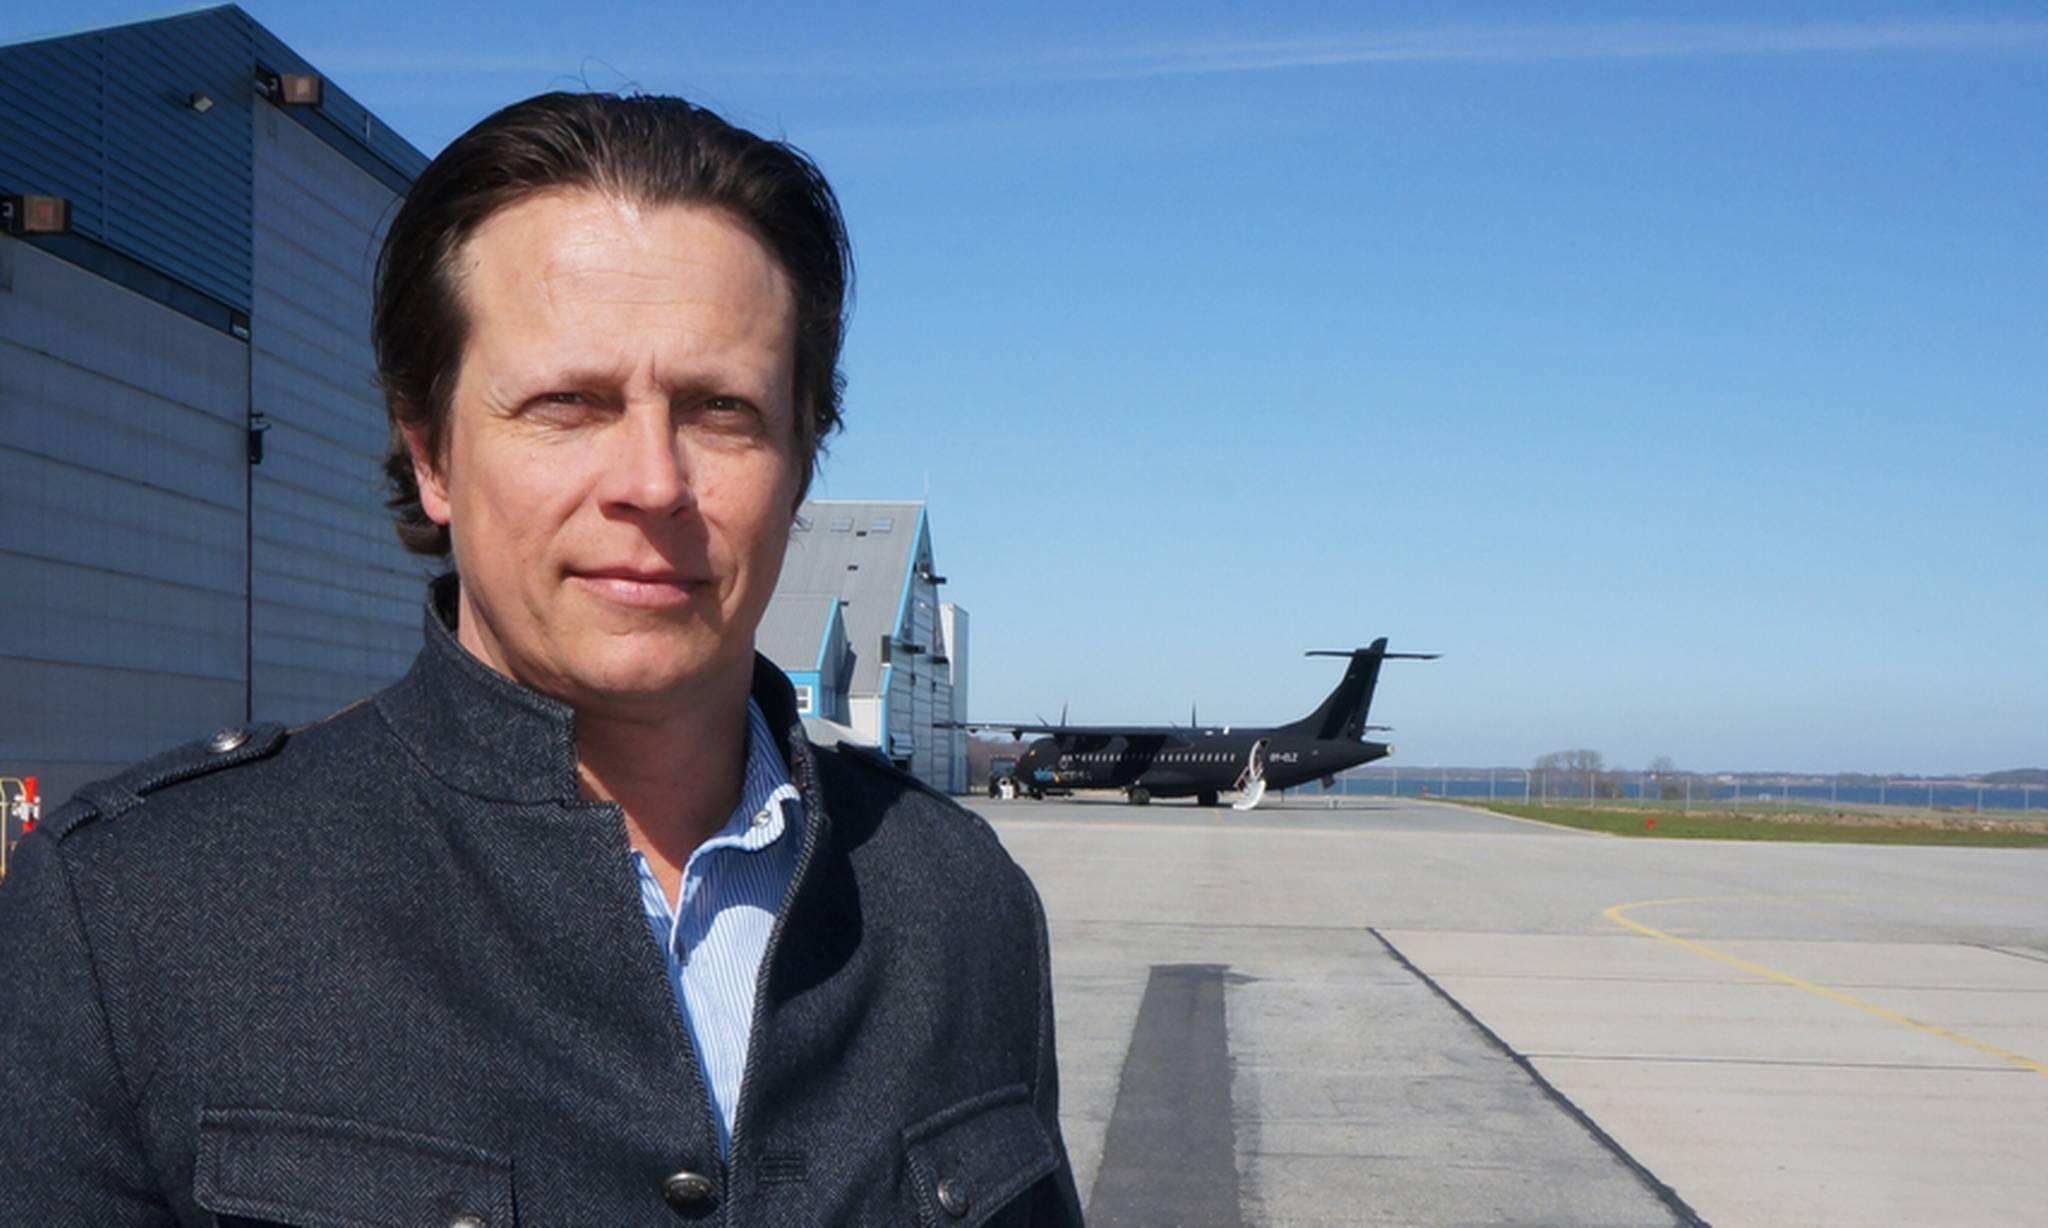 Christian Berg, lufthavnschef i Sønderborg Lufthavn. (Foto: Sønderborg Lufthavn | PR)